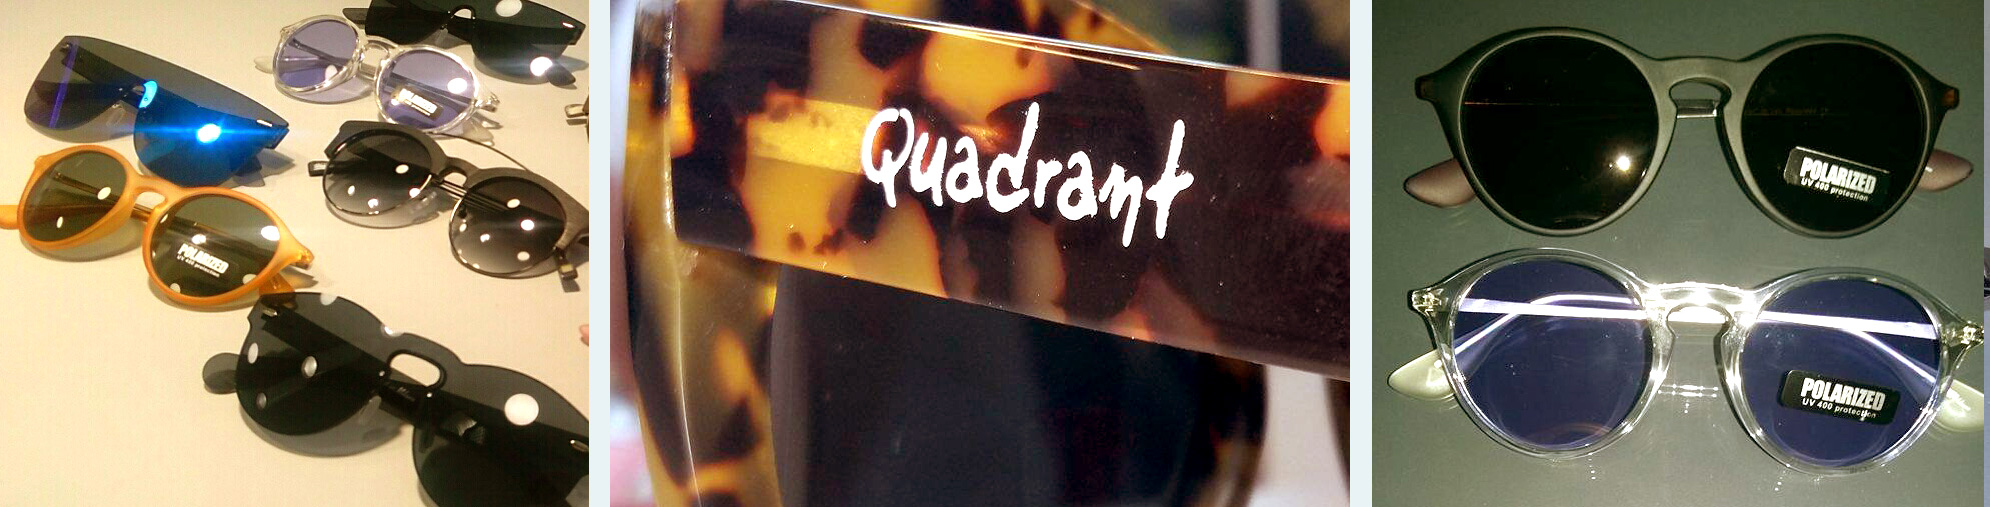 Quadrant eye glasses